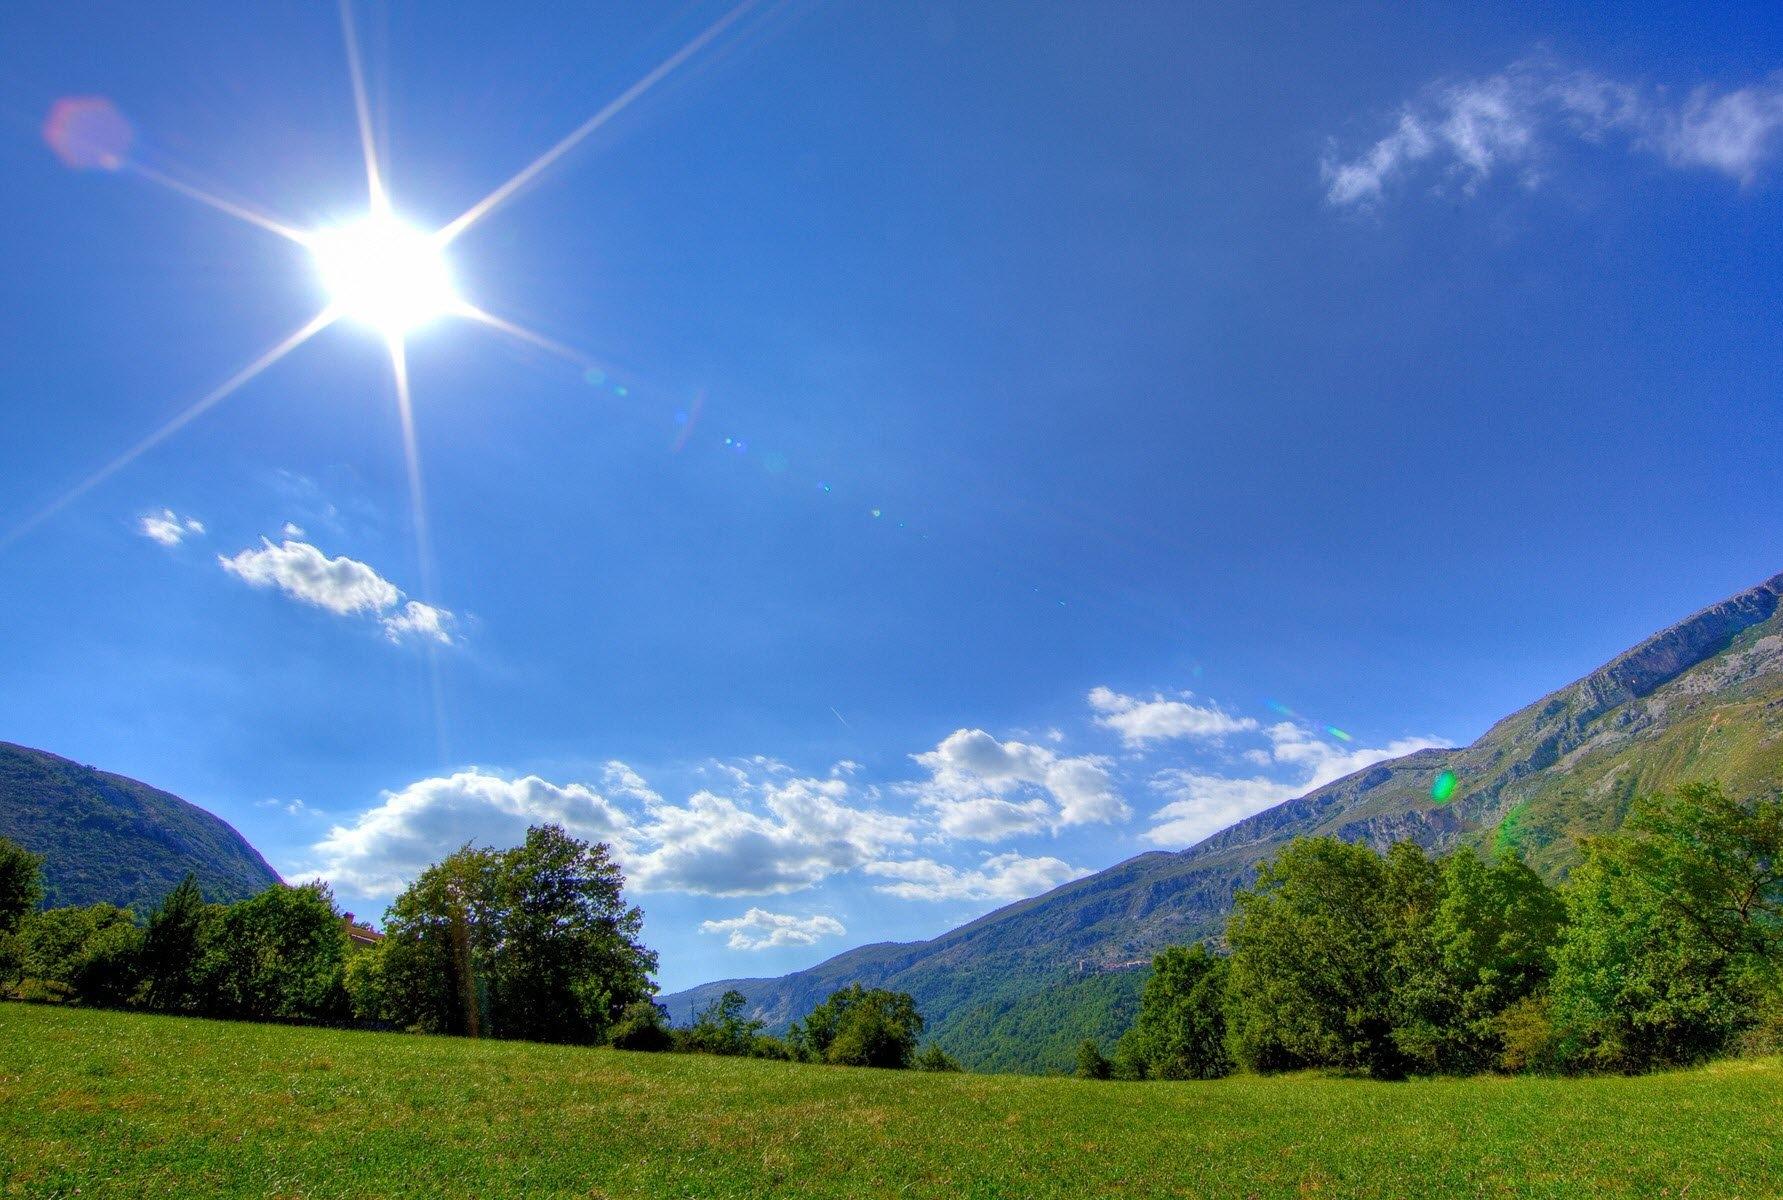 sunny day 2.jpg